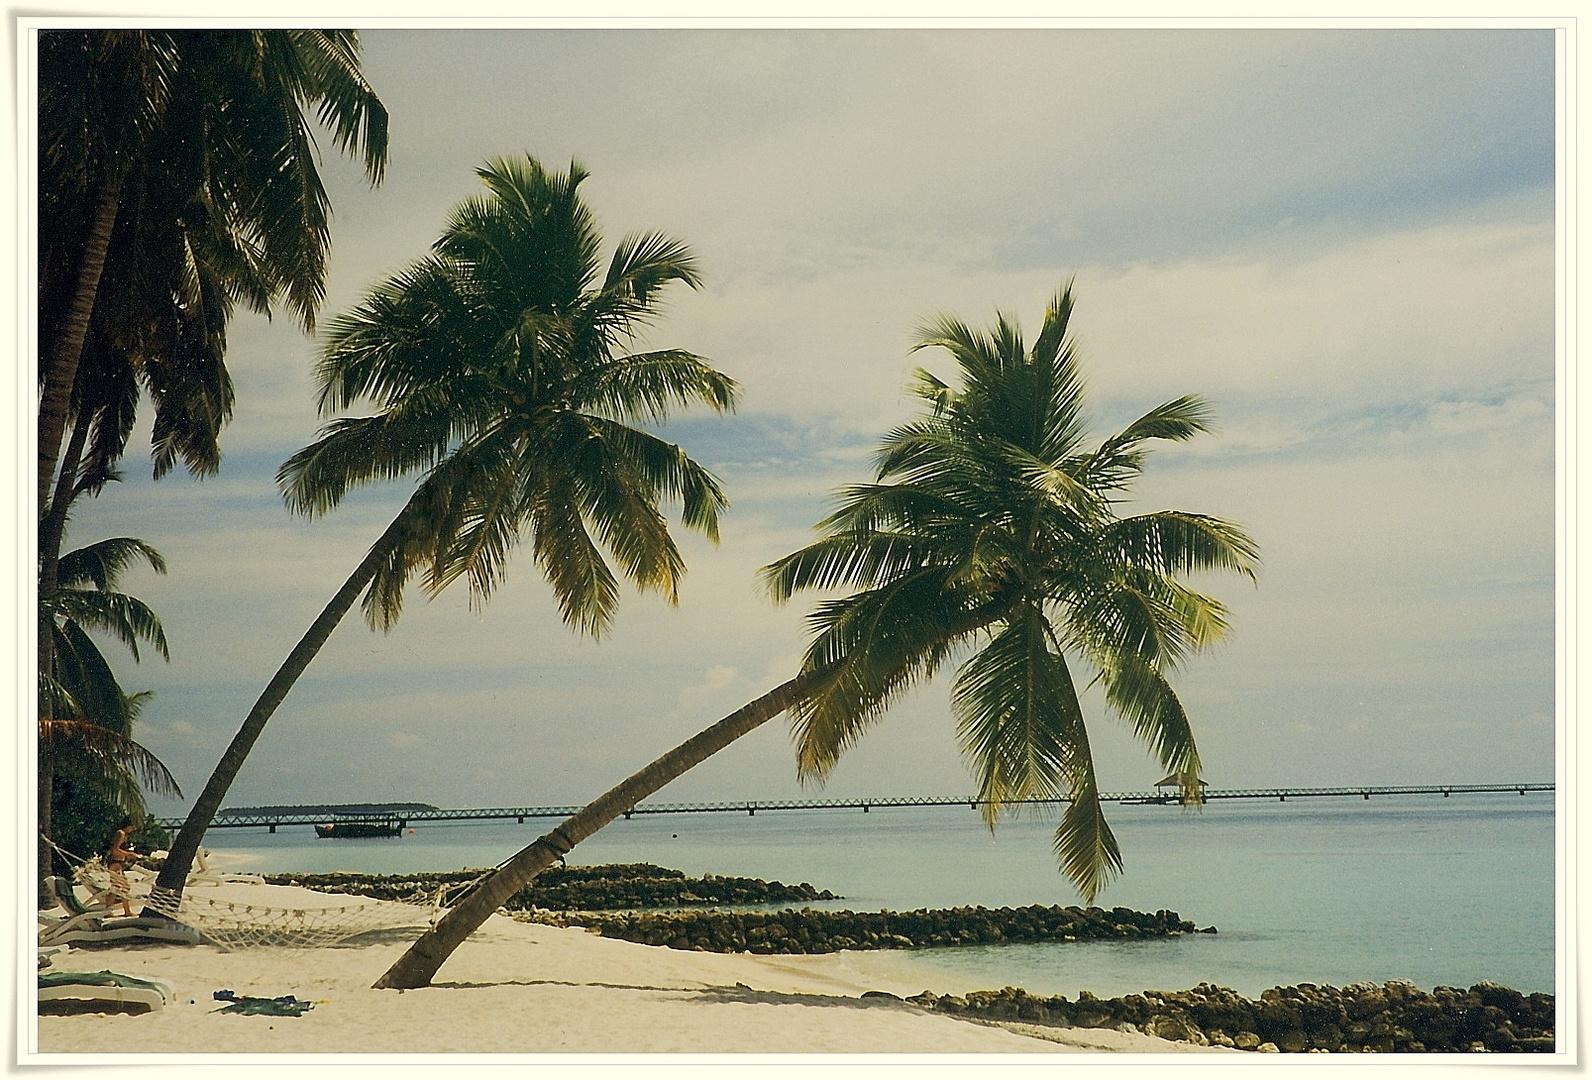 Malediven, Rangali Island